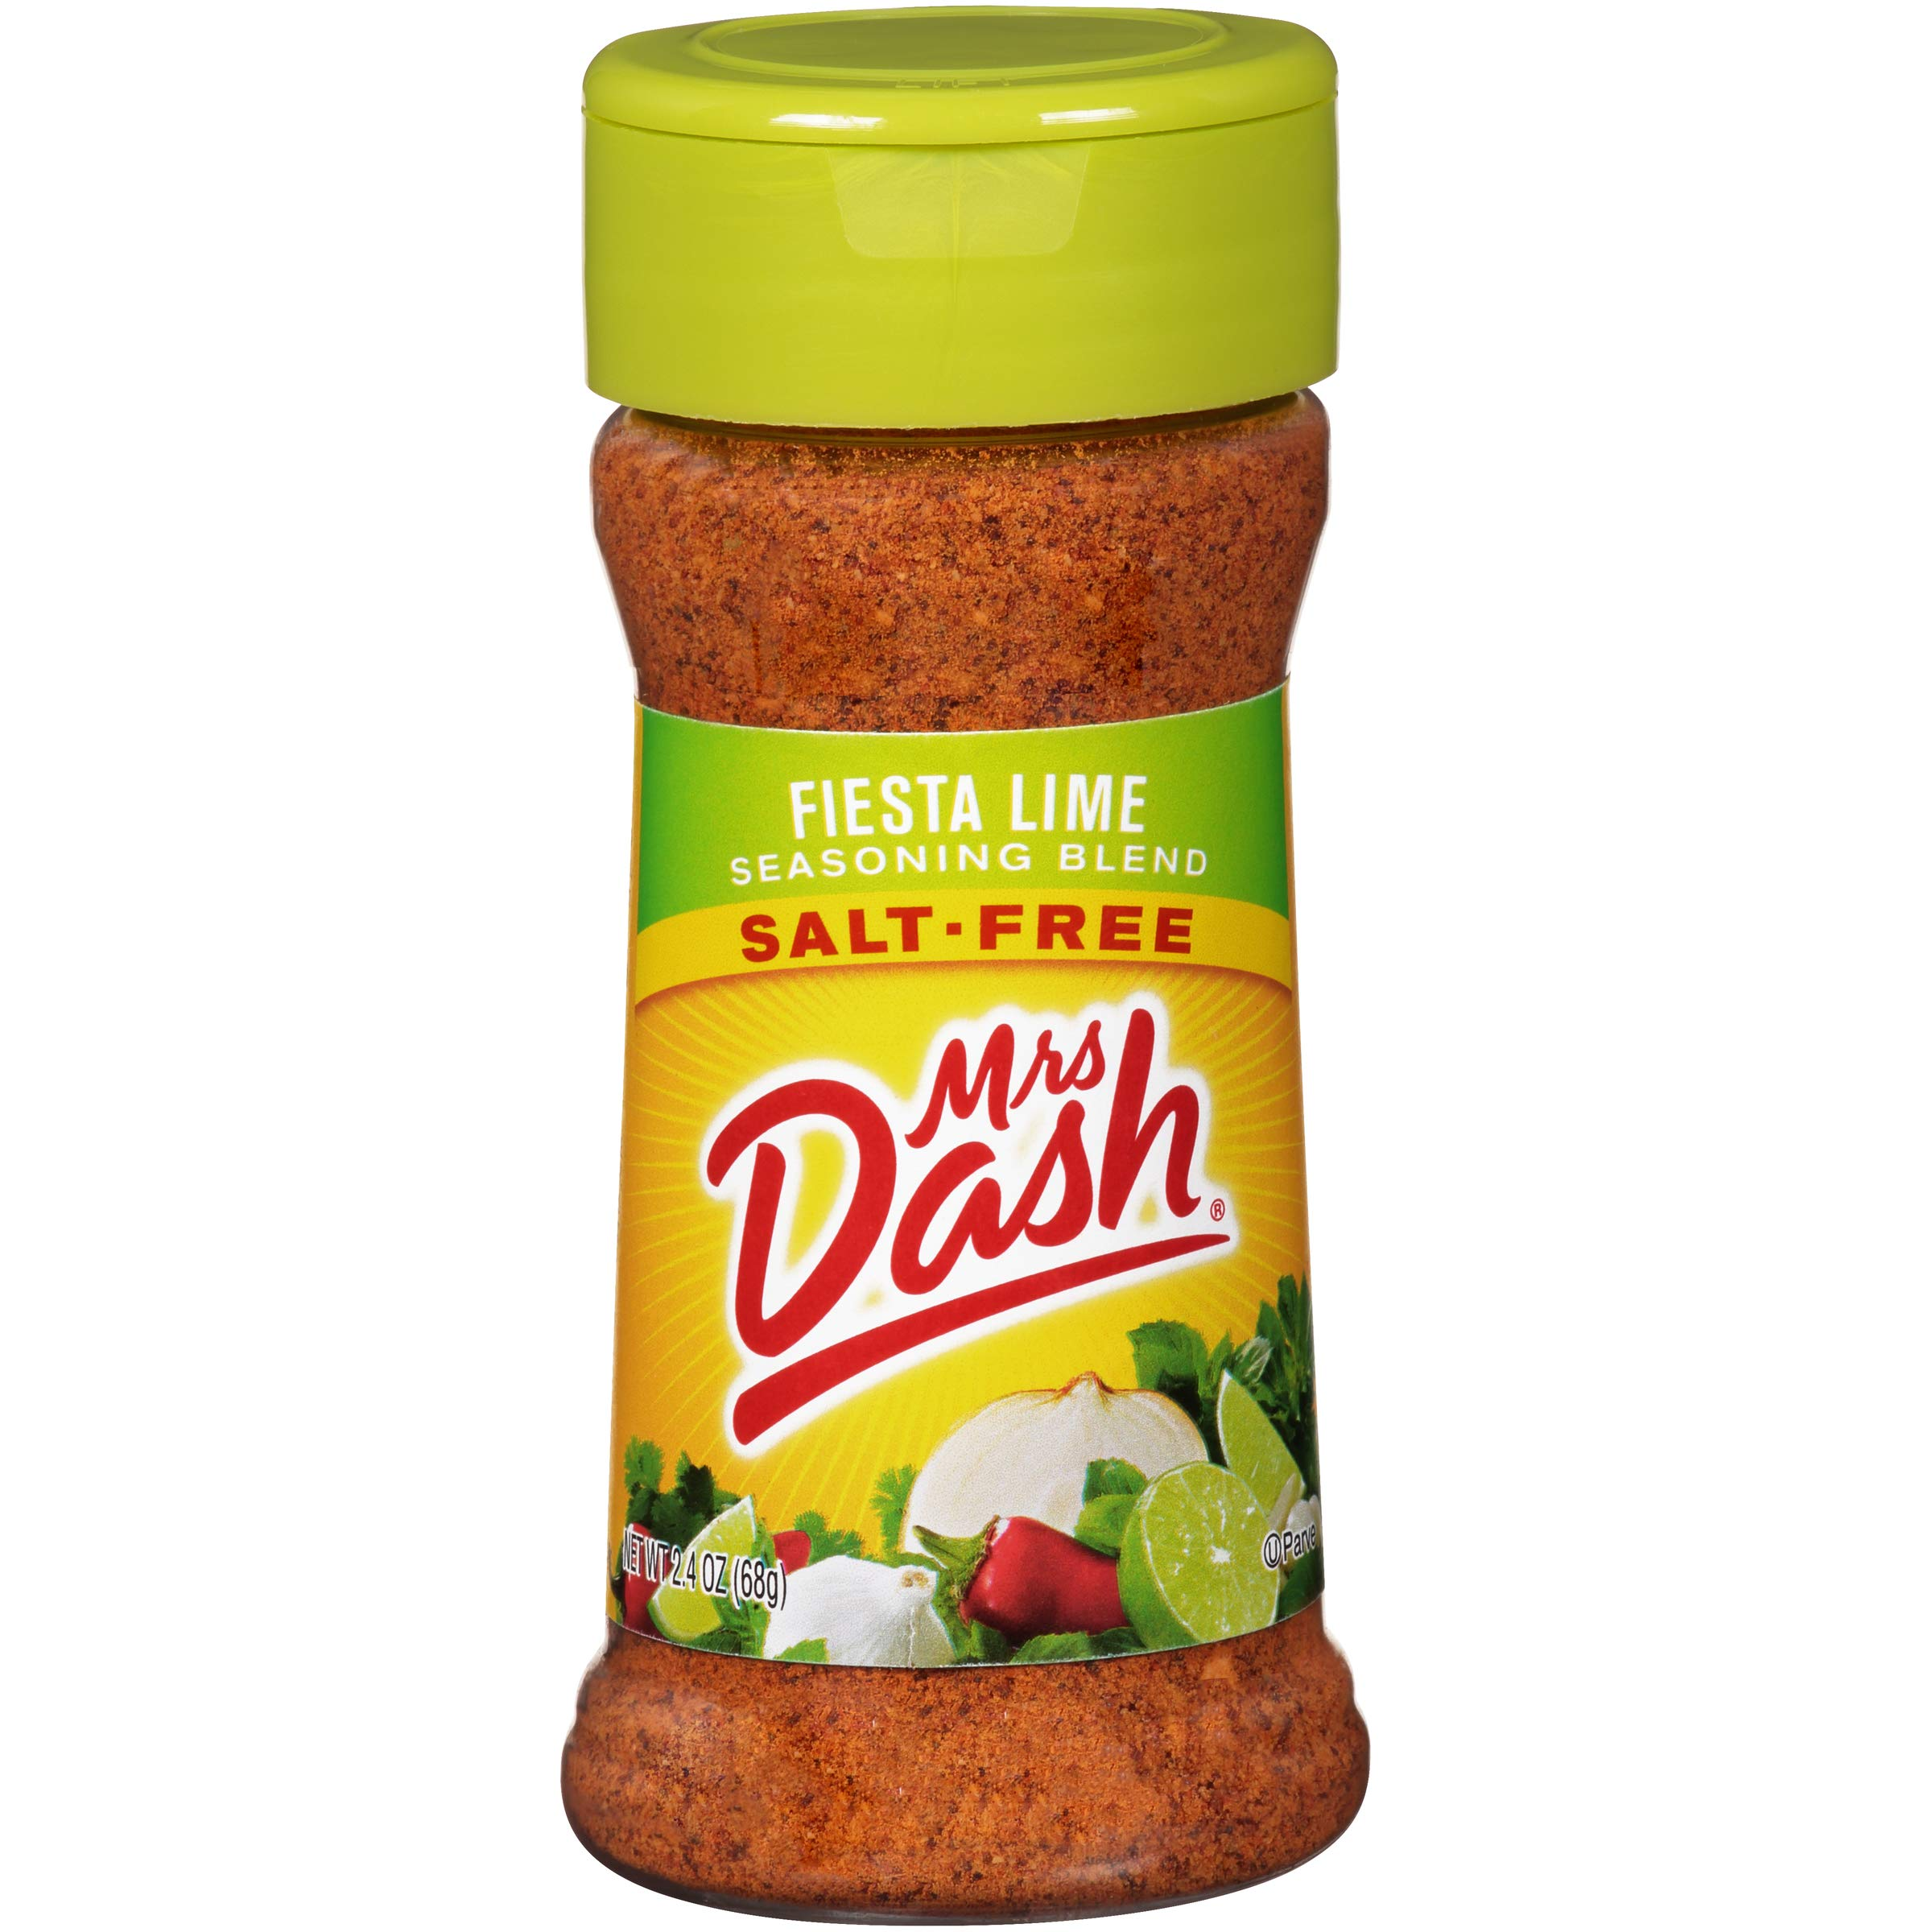 Mrs. Dash, Seasoning Blend, Fiesta Lime, 2.4 Ounce (Pack of 12)